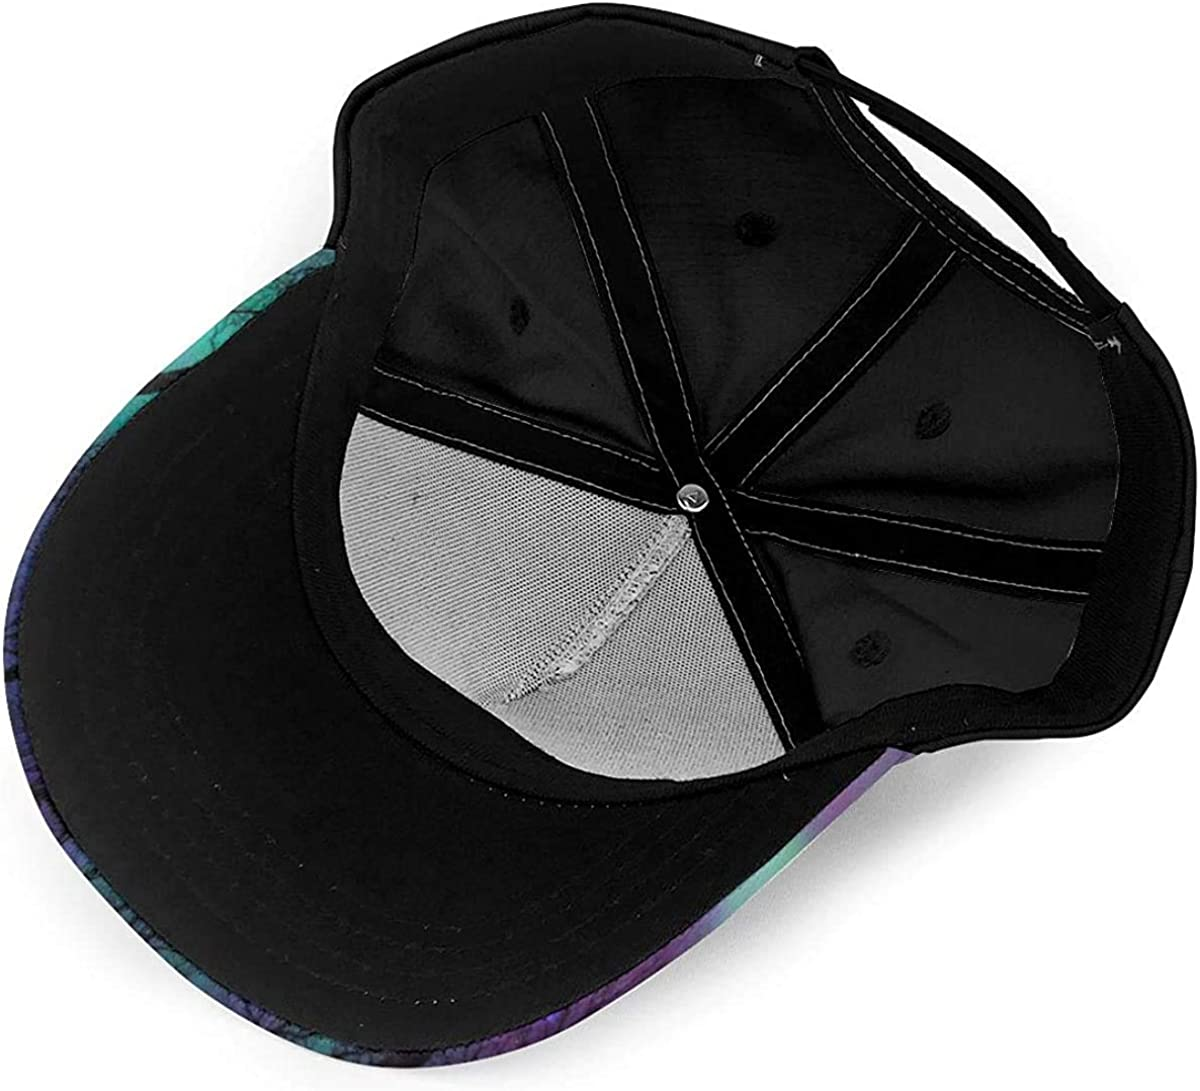 The Northern Lights Aurora Polar Light Lightweight Unisex Baseball Caps Adjustable Breathable Sun Hat for Sport Outdoor